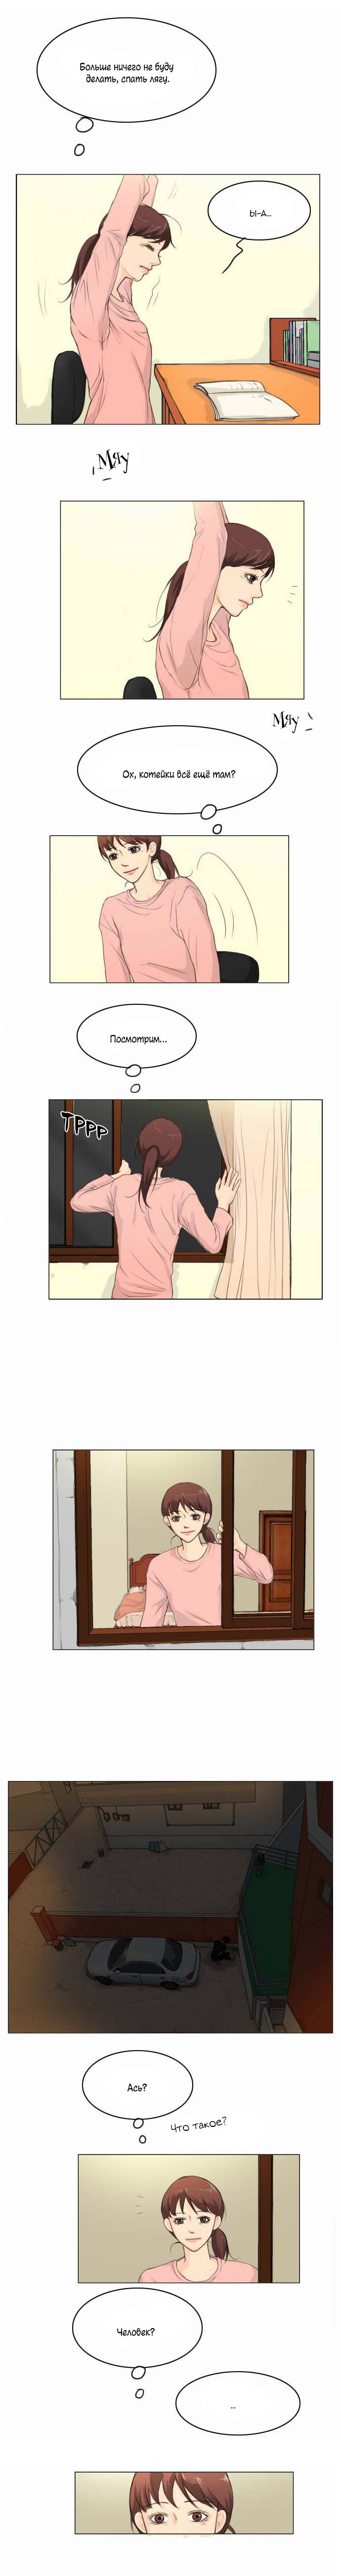 https://r1.ninemanga.com/comics/pic2/8/31048/304468/1467014767568.jpg Page 3